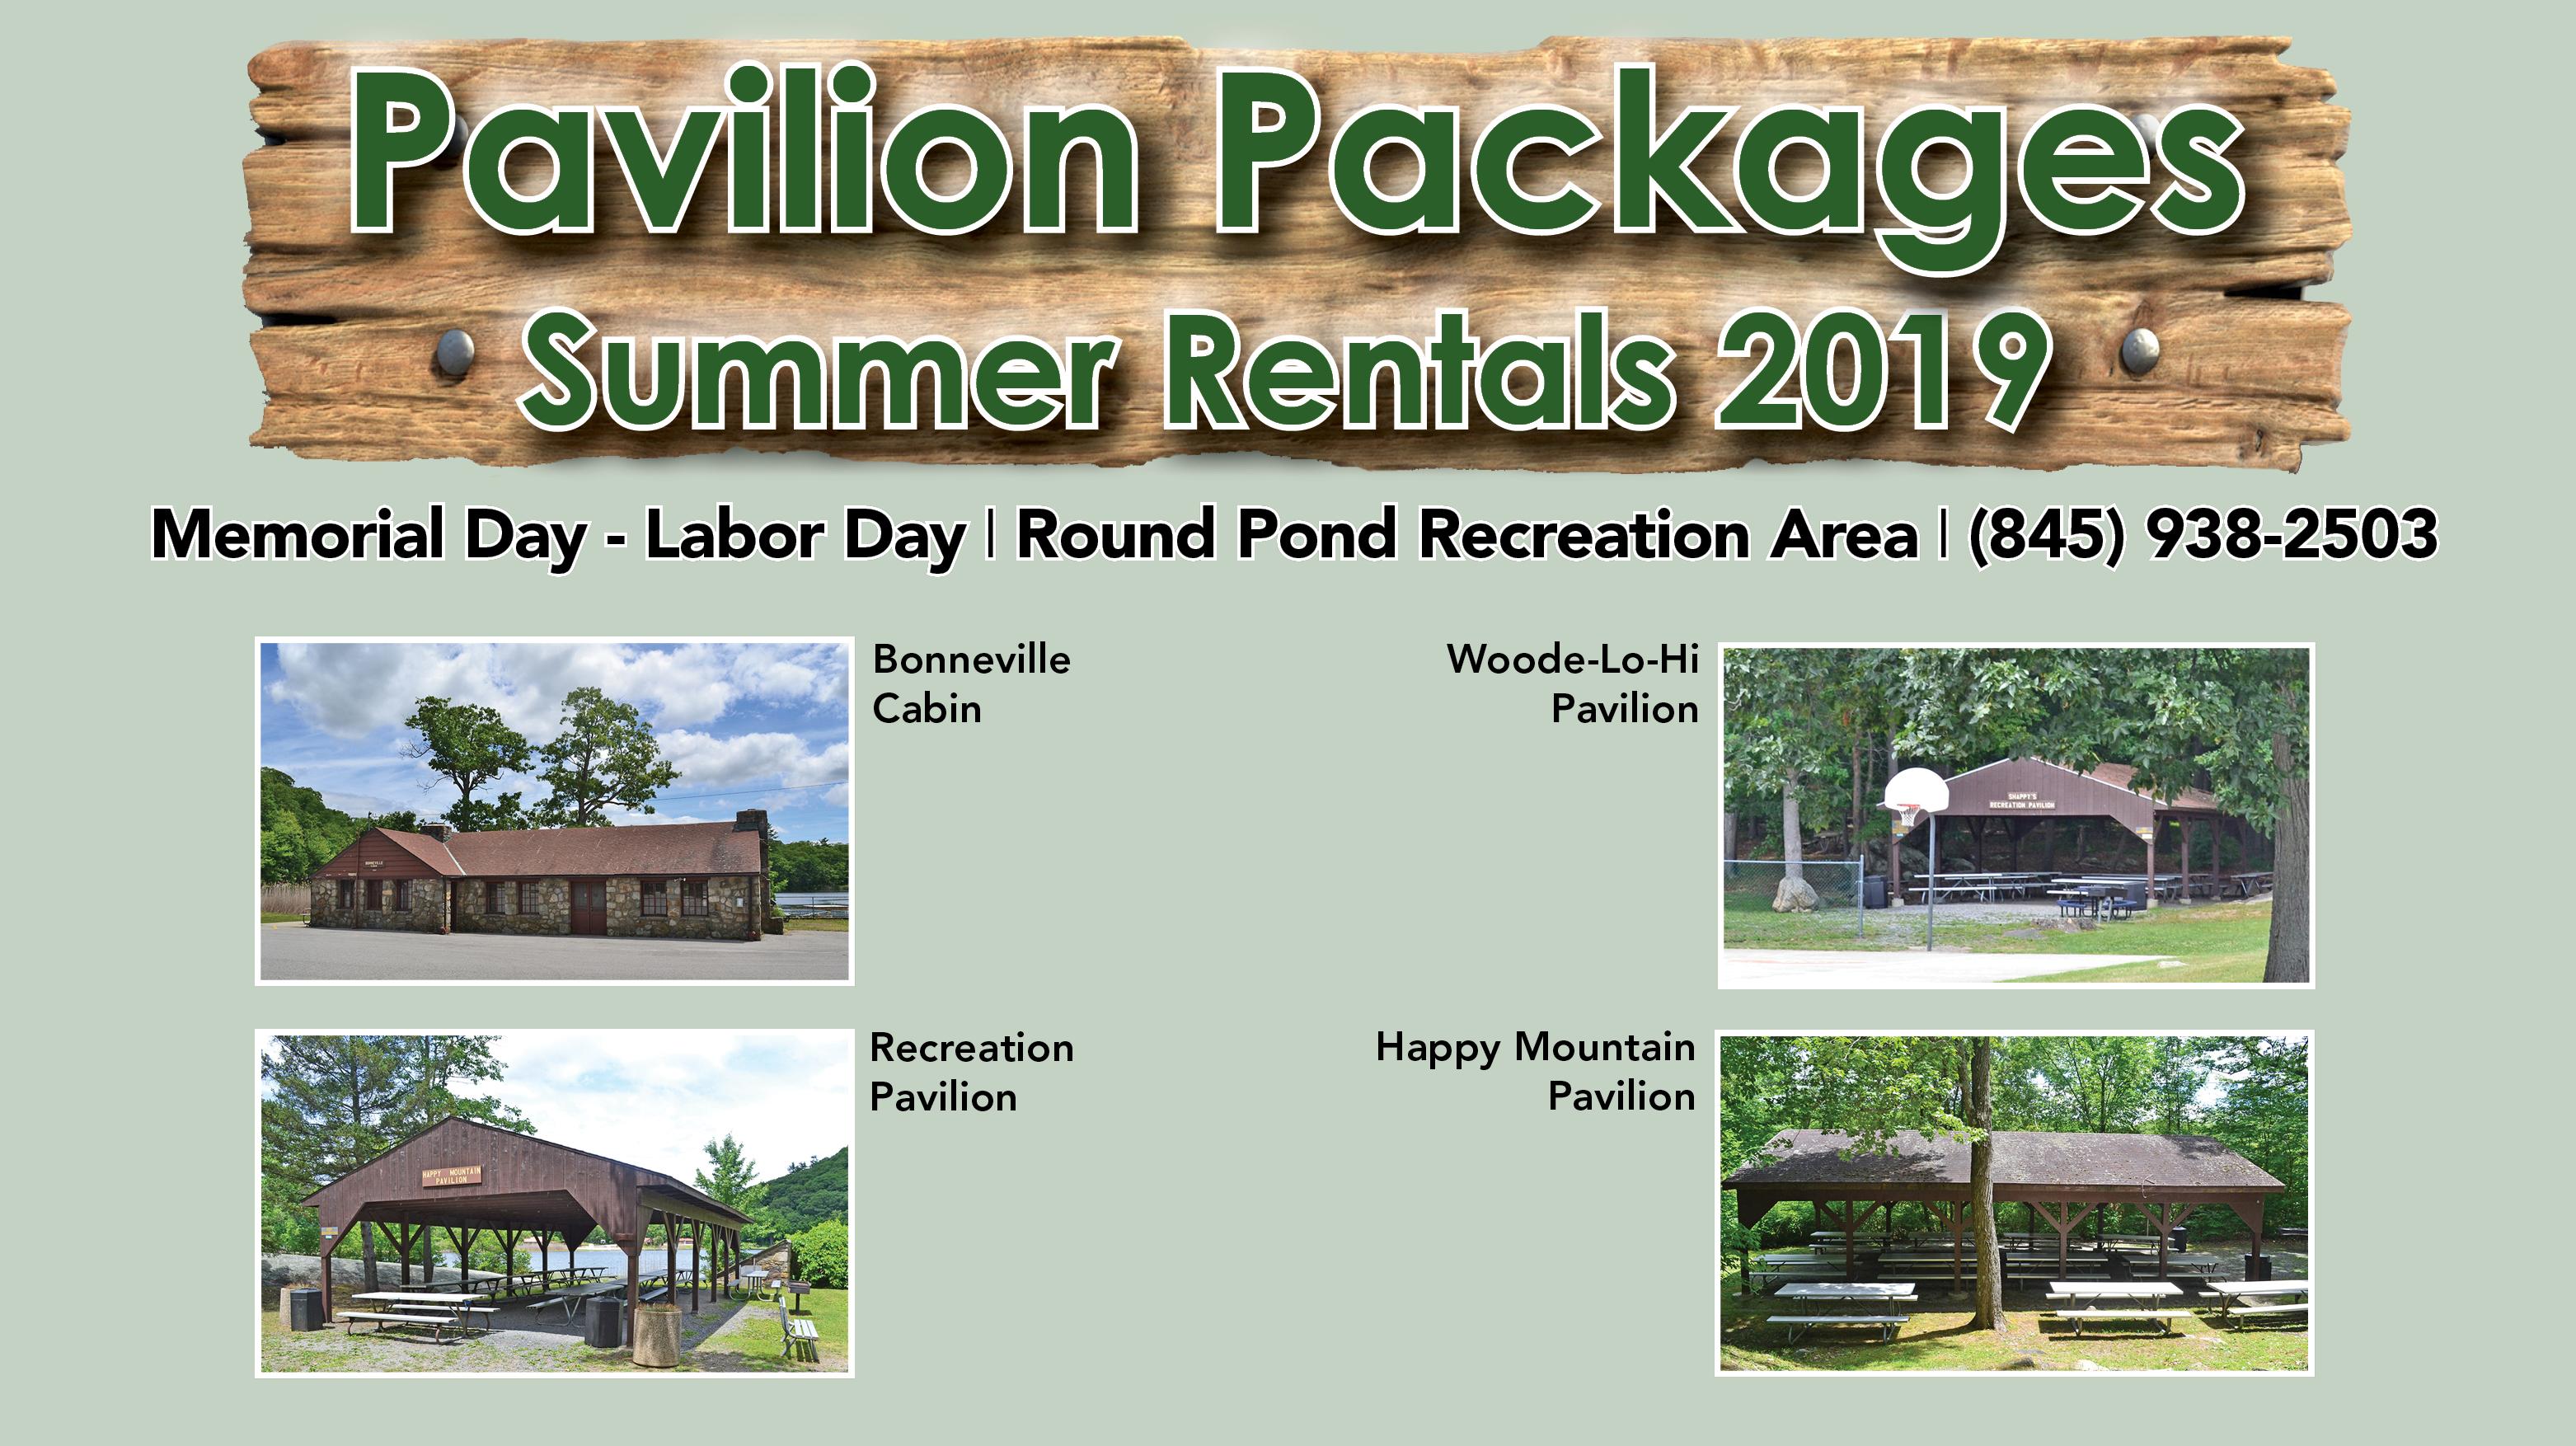 Pavilion Packages Summer 2019